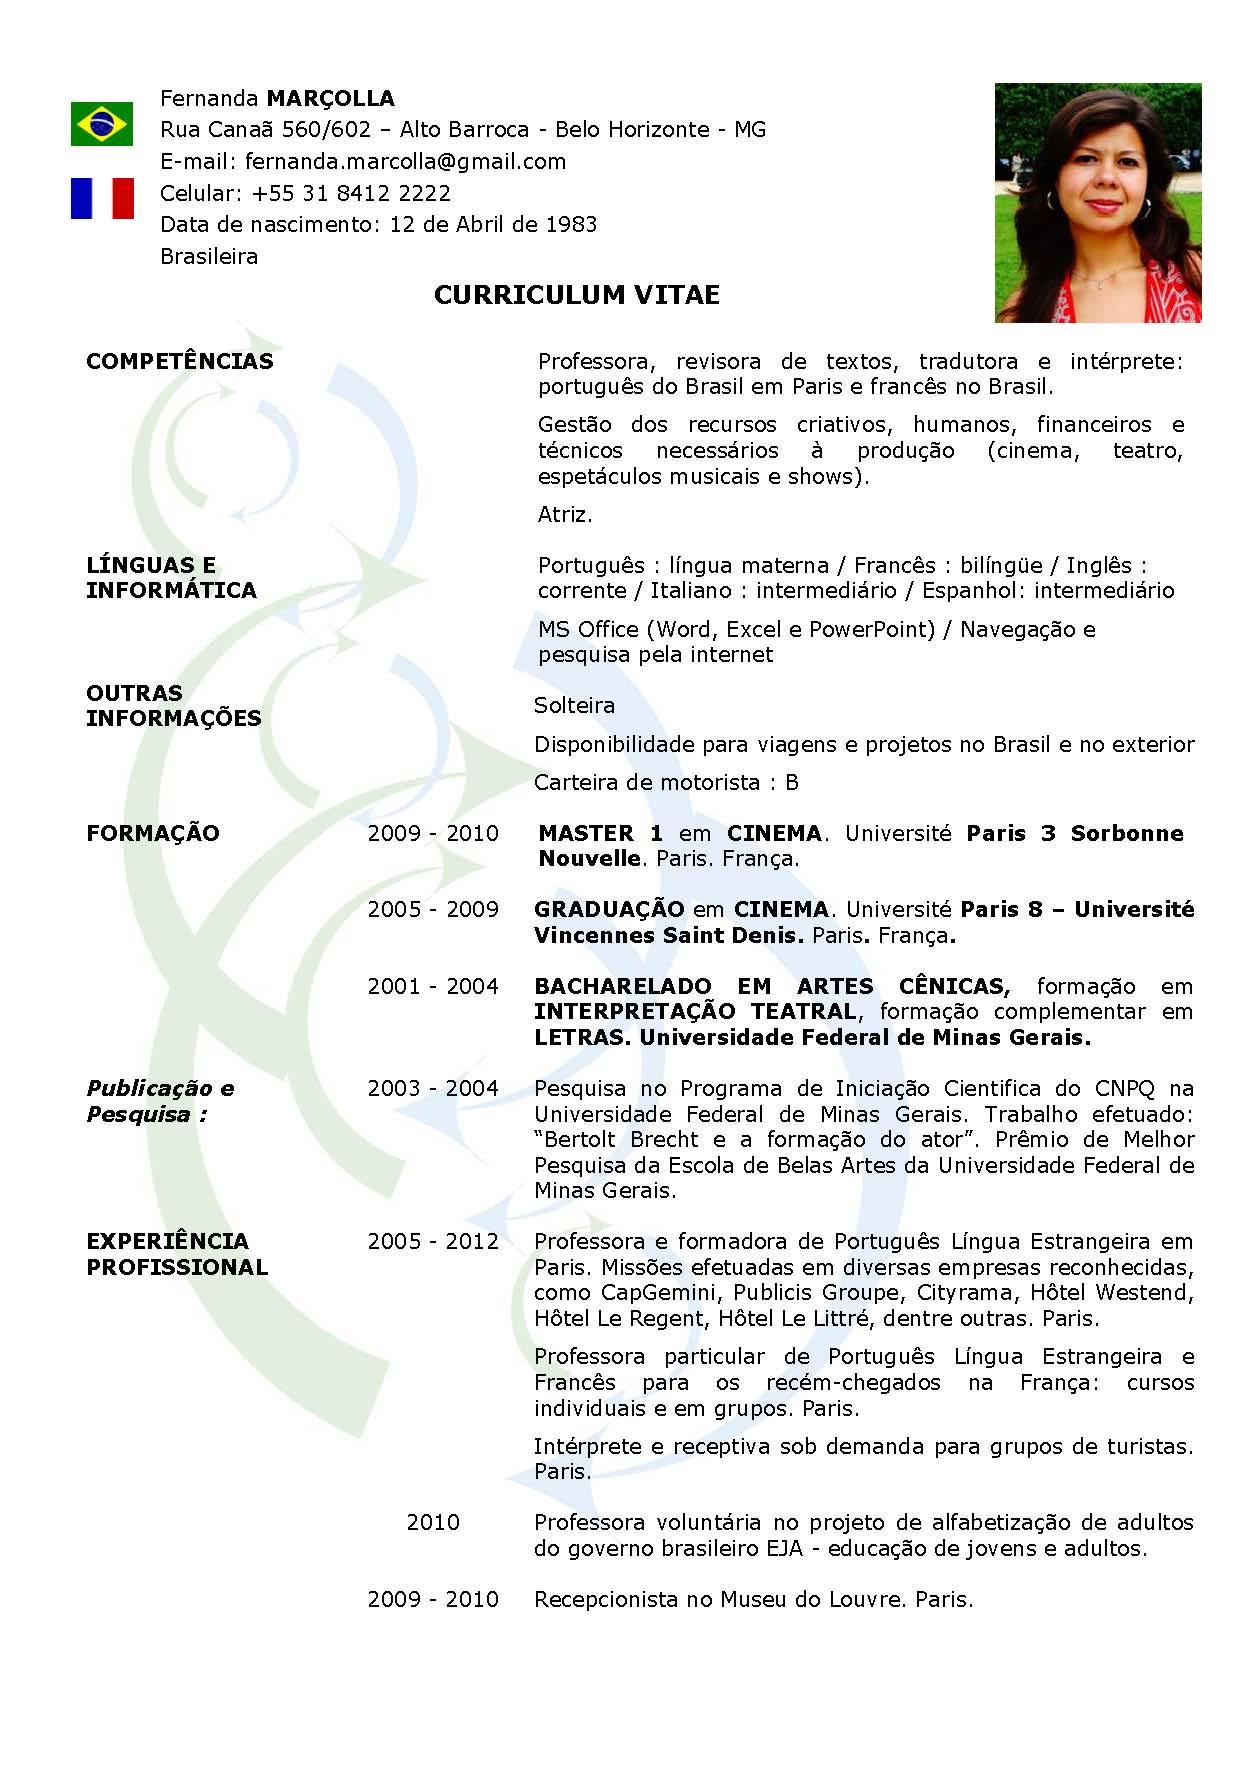 61 Curriculum Vitae Europass Exemplo Word Exemplo Word Vitae